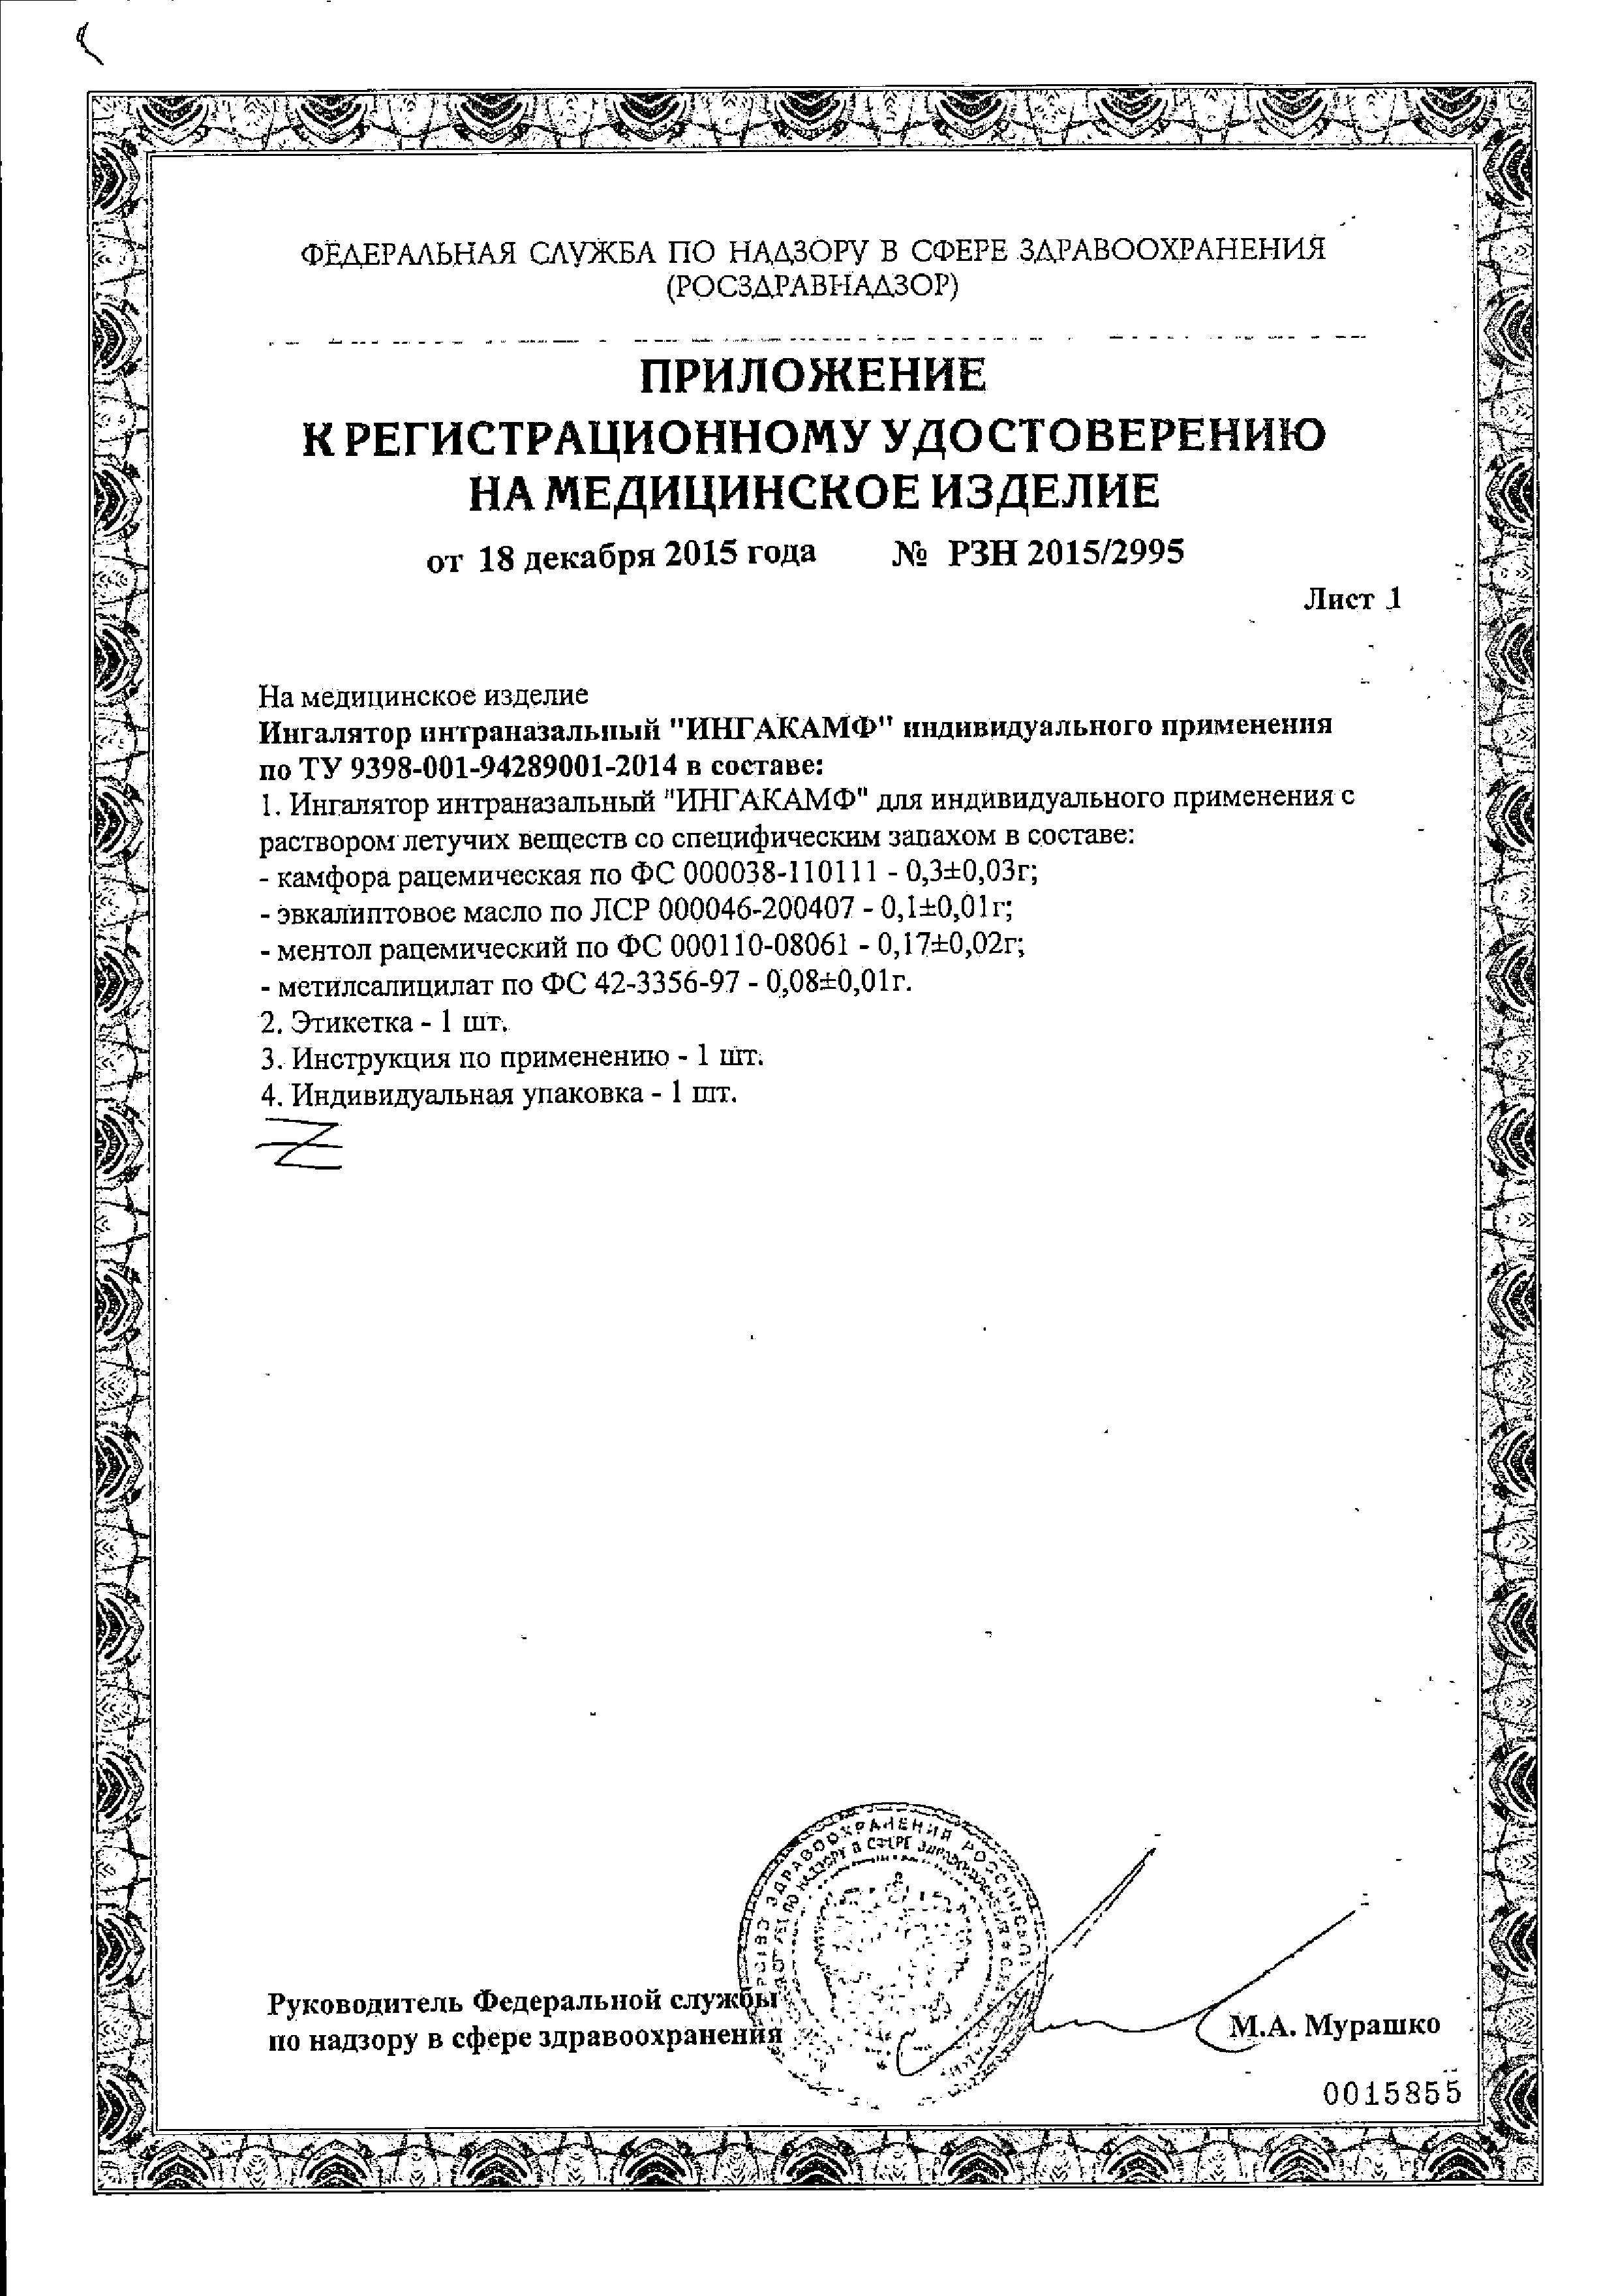 Ингакамф сертификат